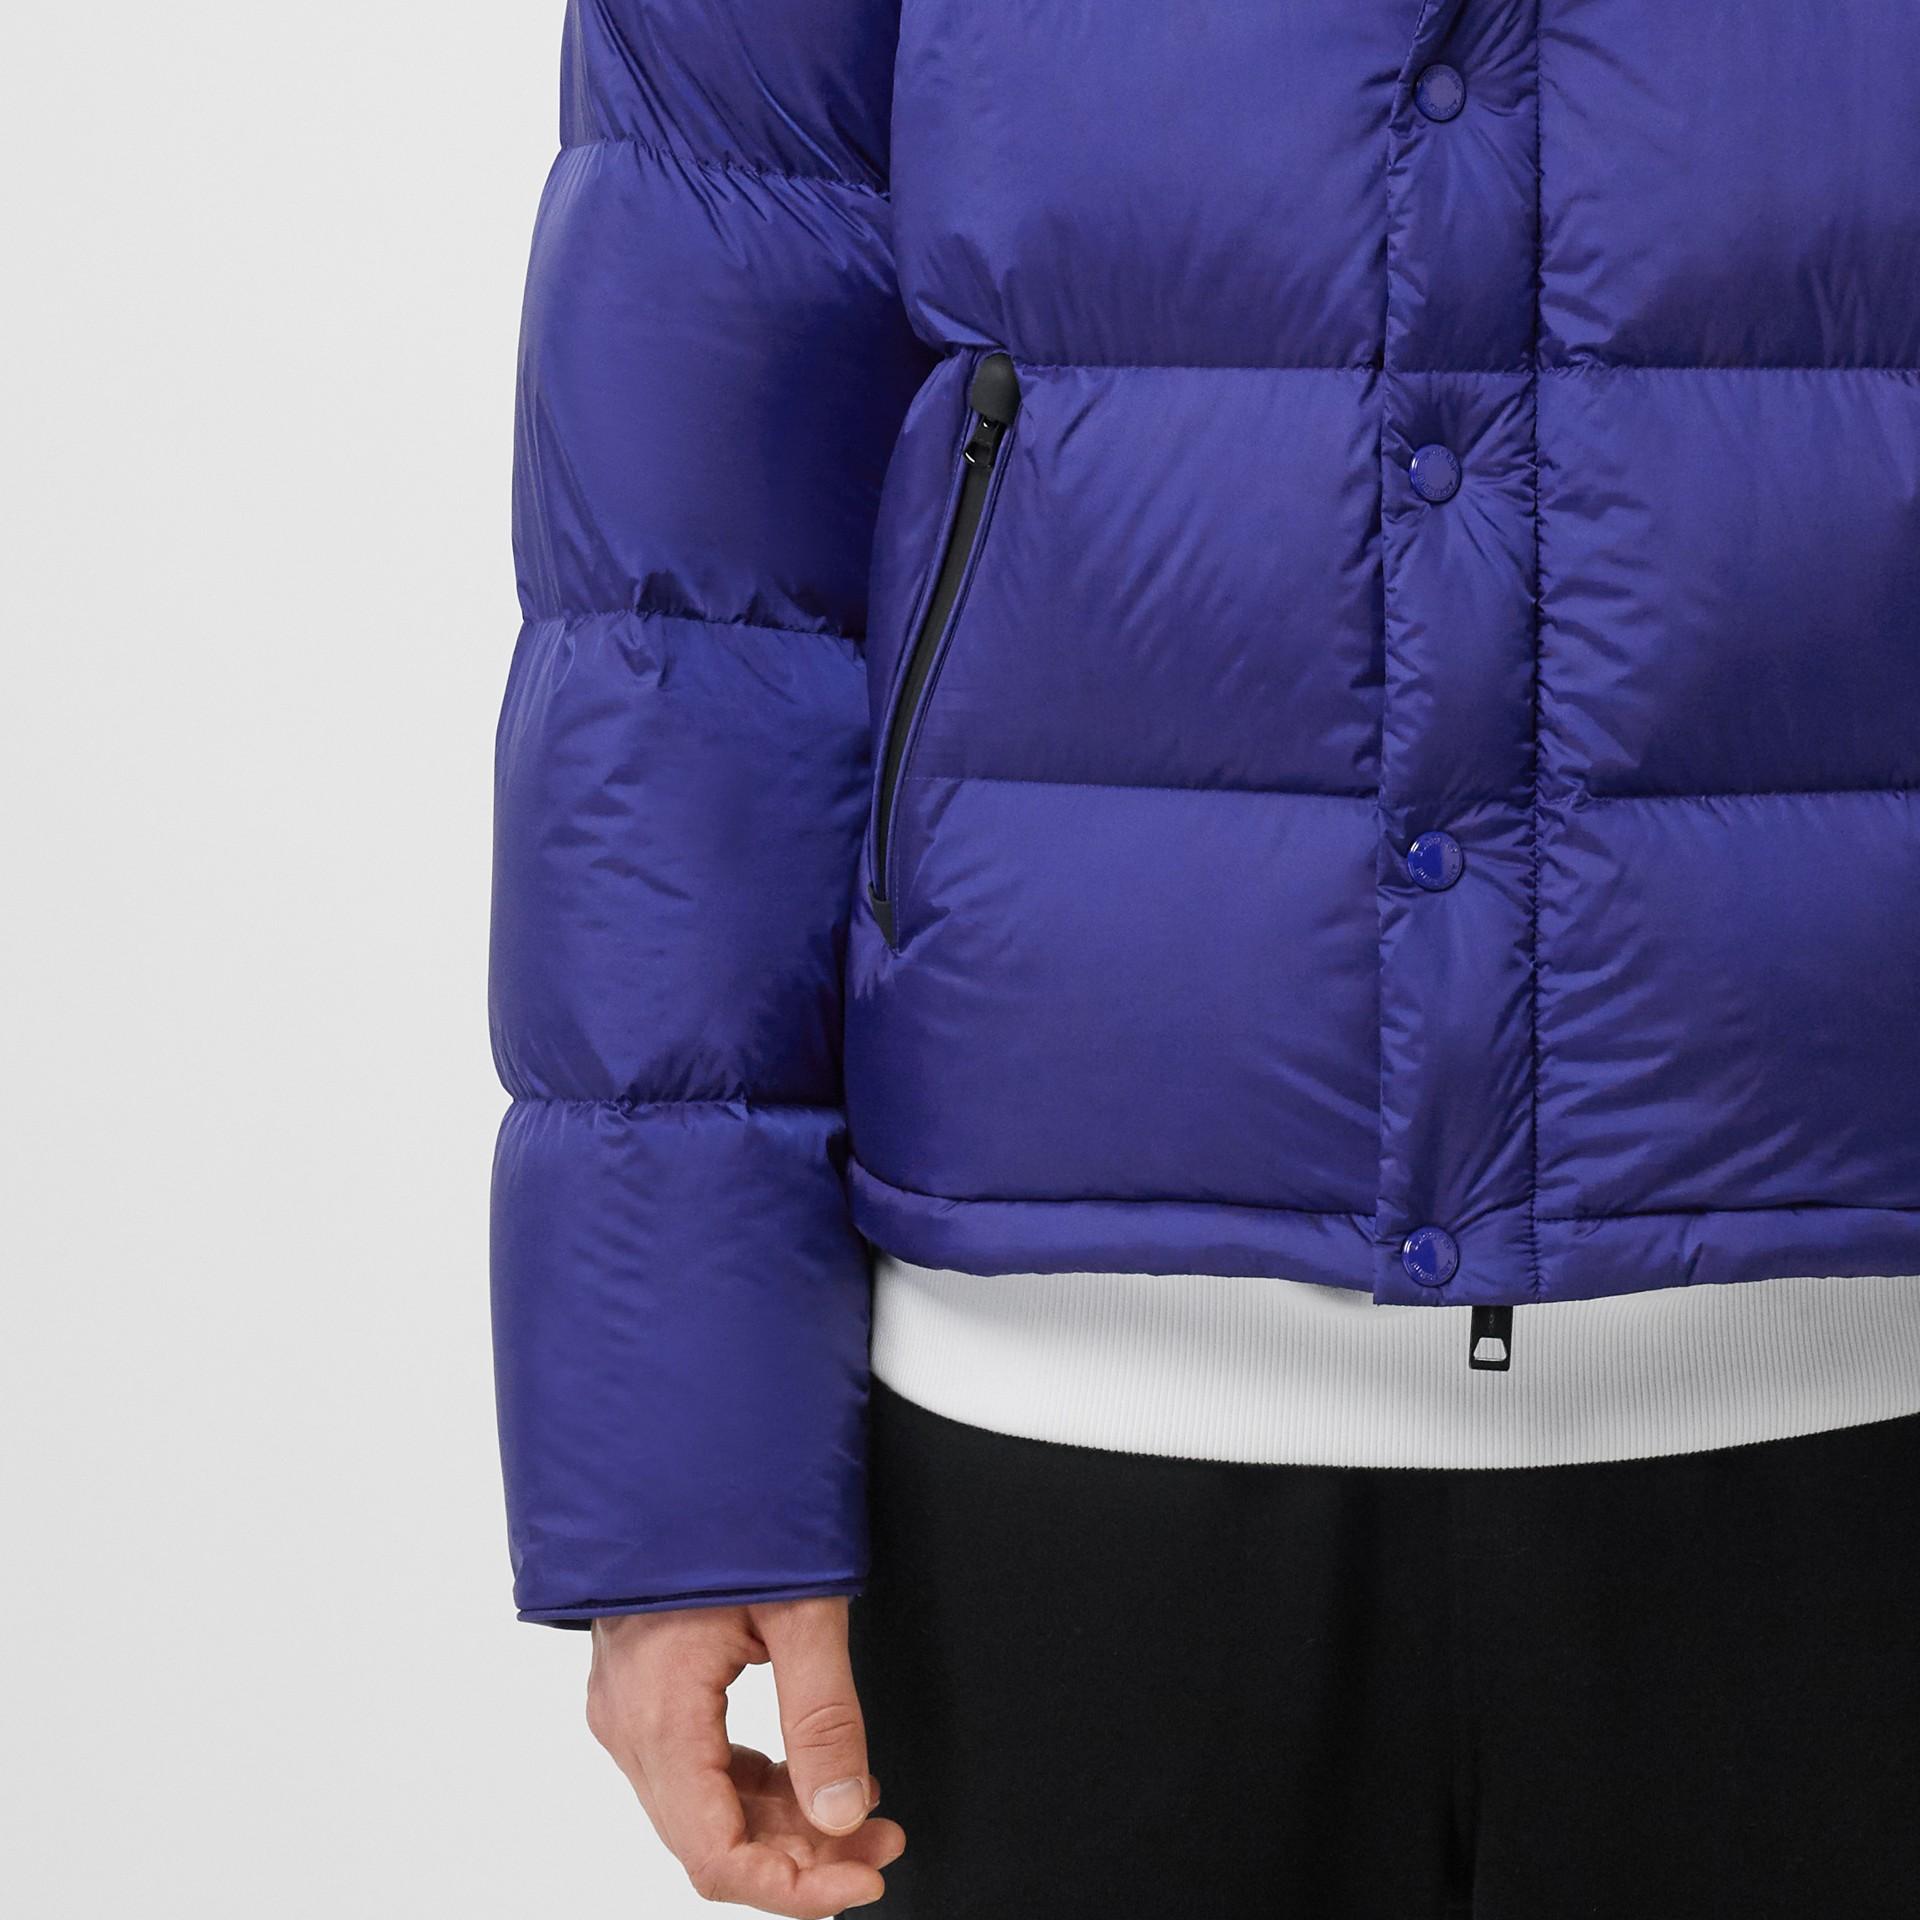 Detachable Sleeve Hooded Puffer Jacket in Dark Cobalt Blue - Men | Burberry - gallery image 1